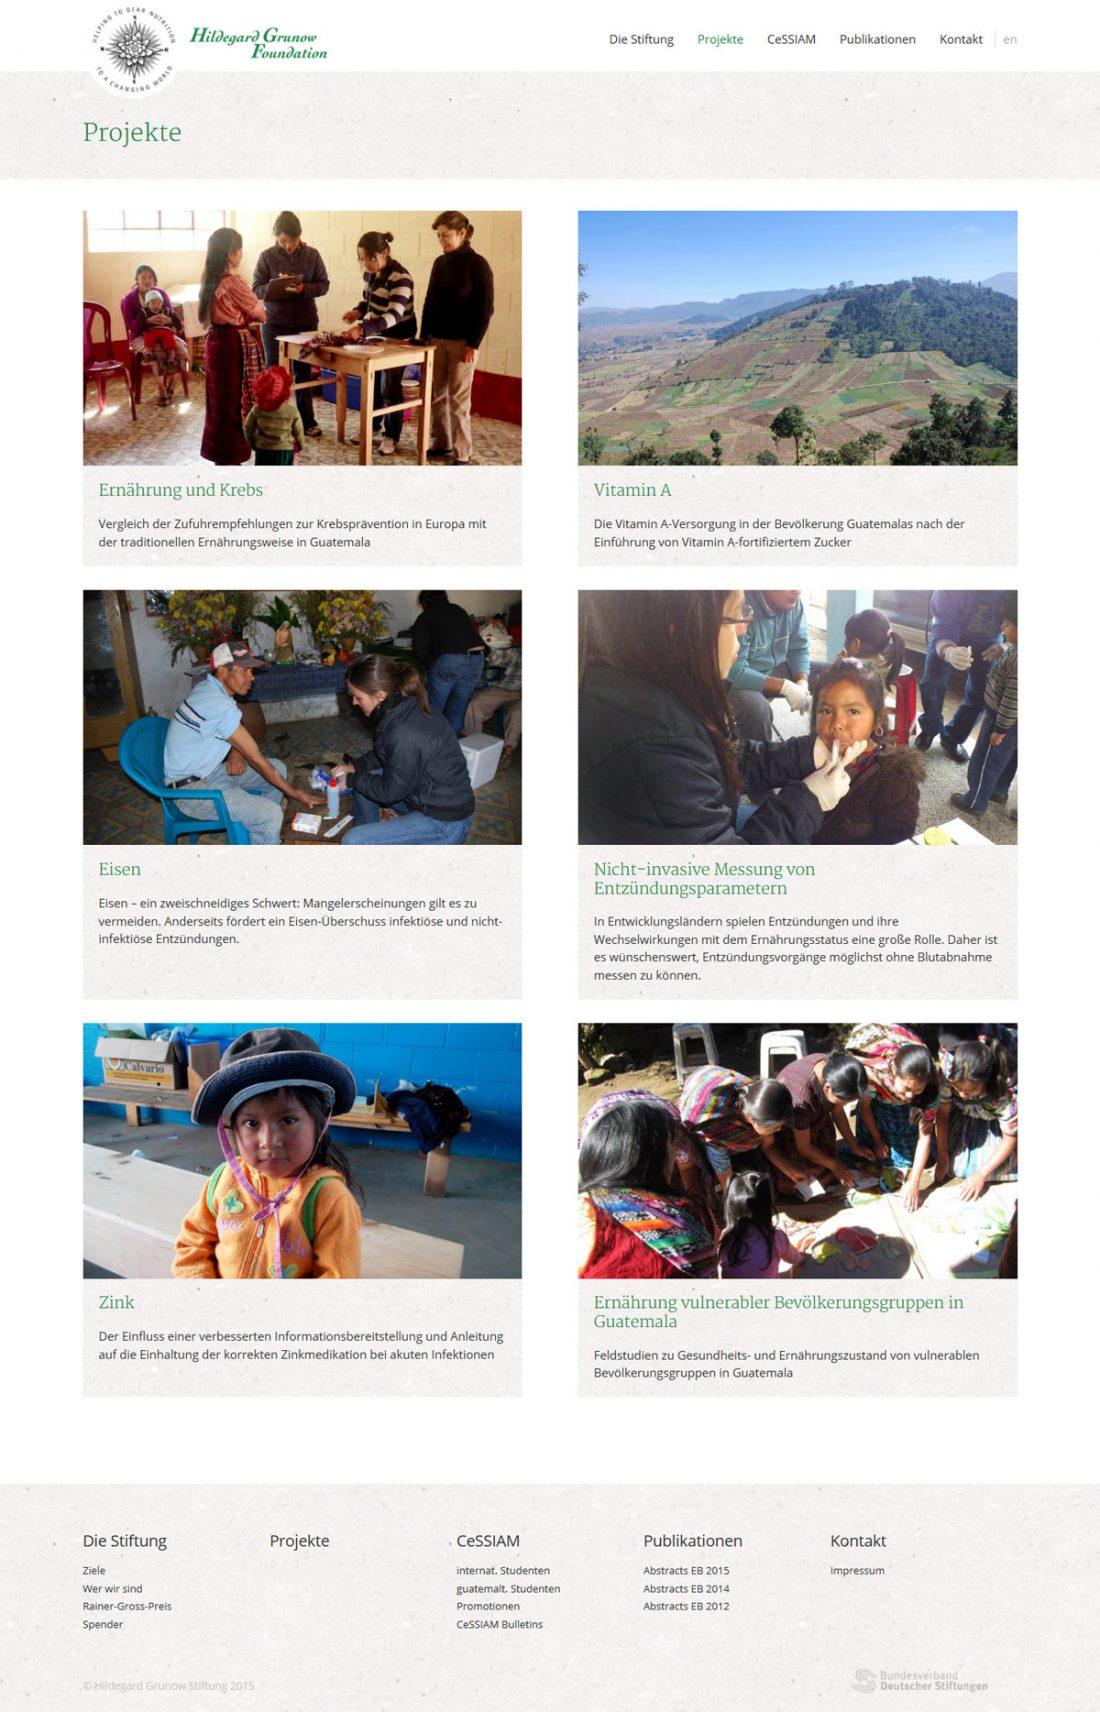 Screenshot Webseite Hildegard Grunow Stiftung